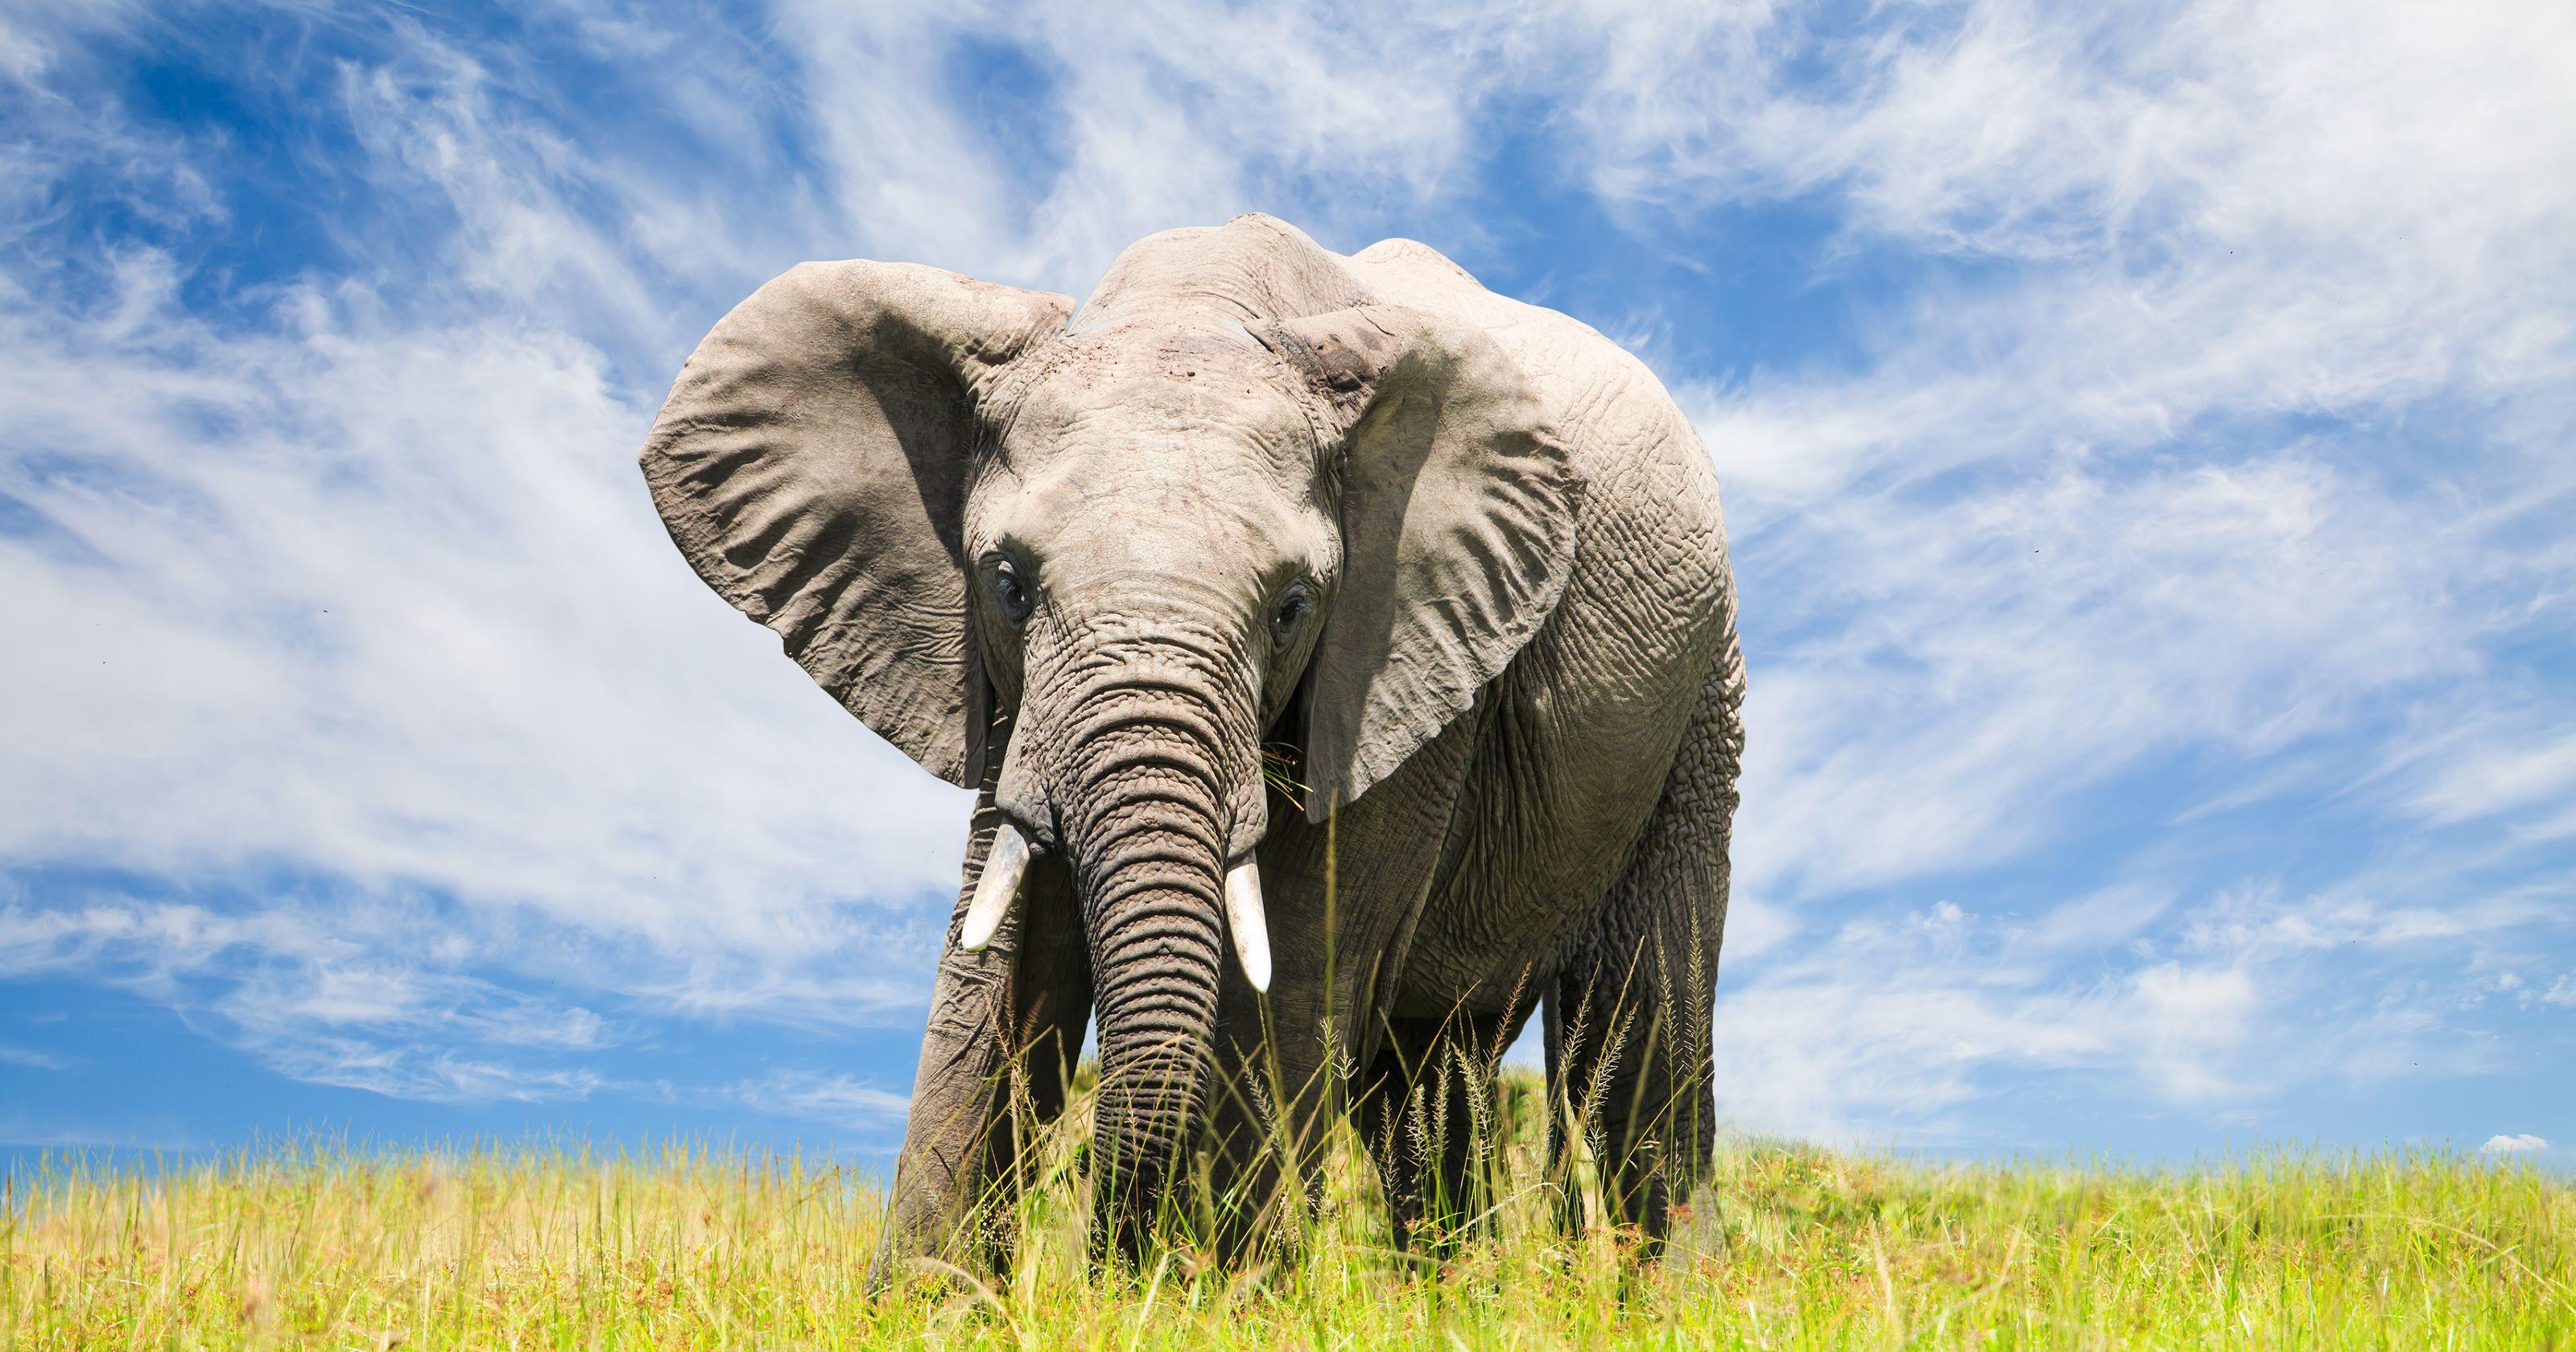 African elephants escape Georgia tractor-trailer fire